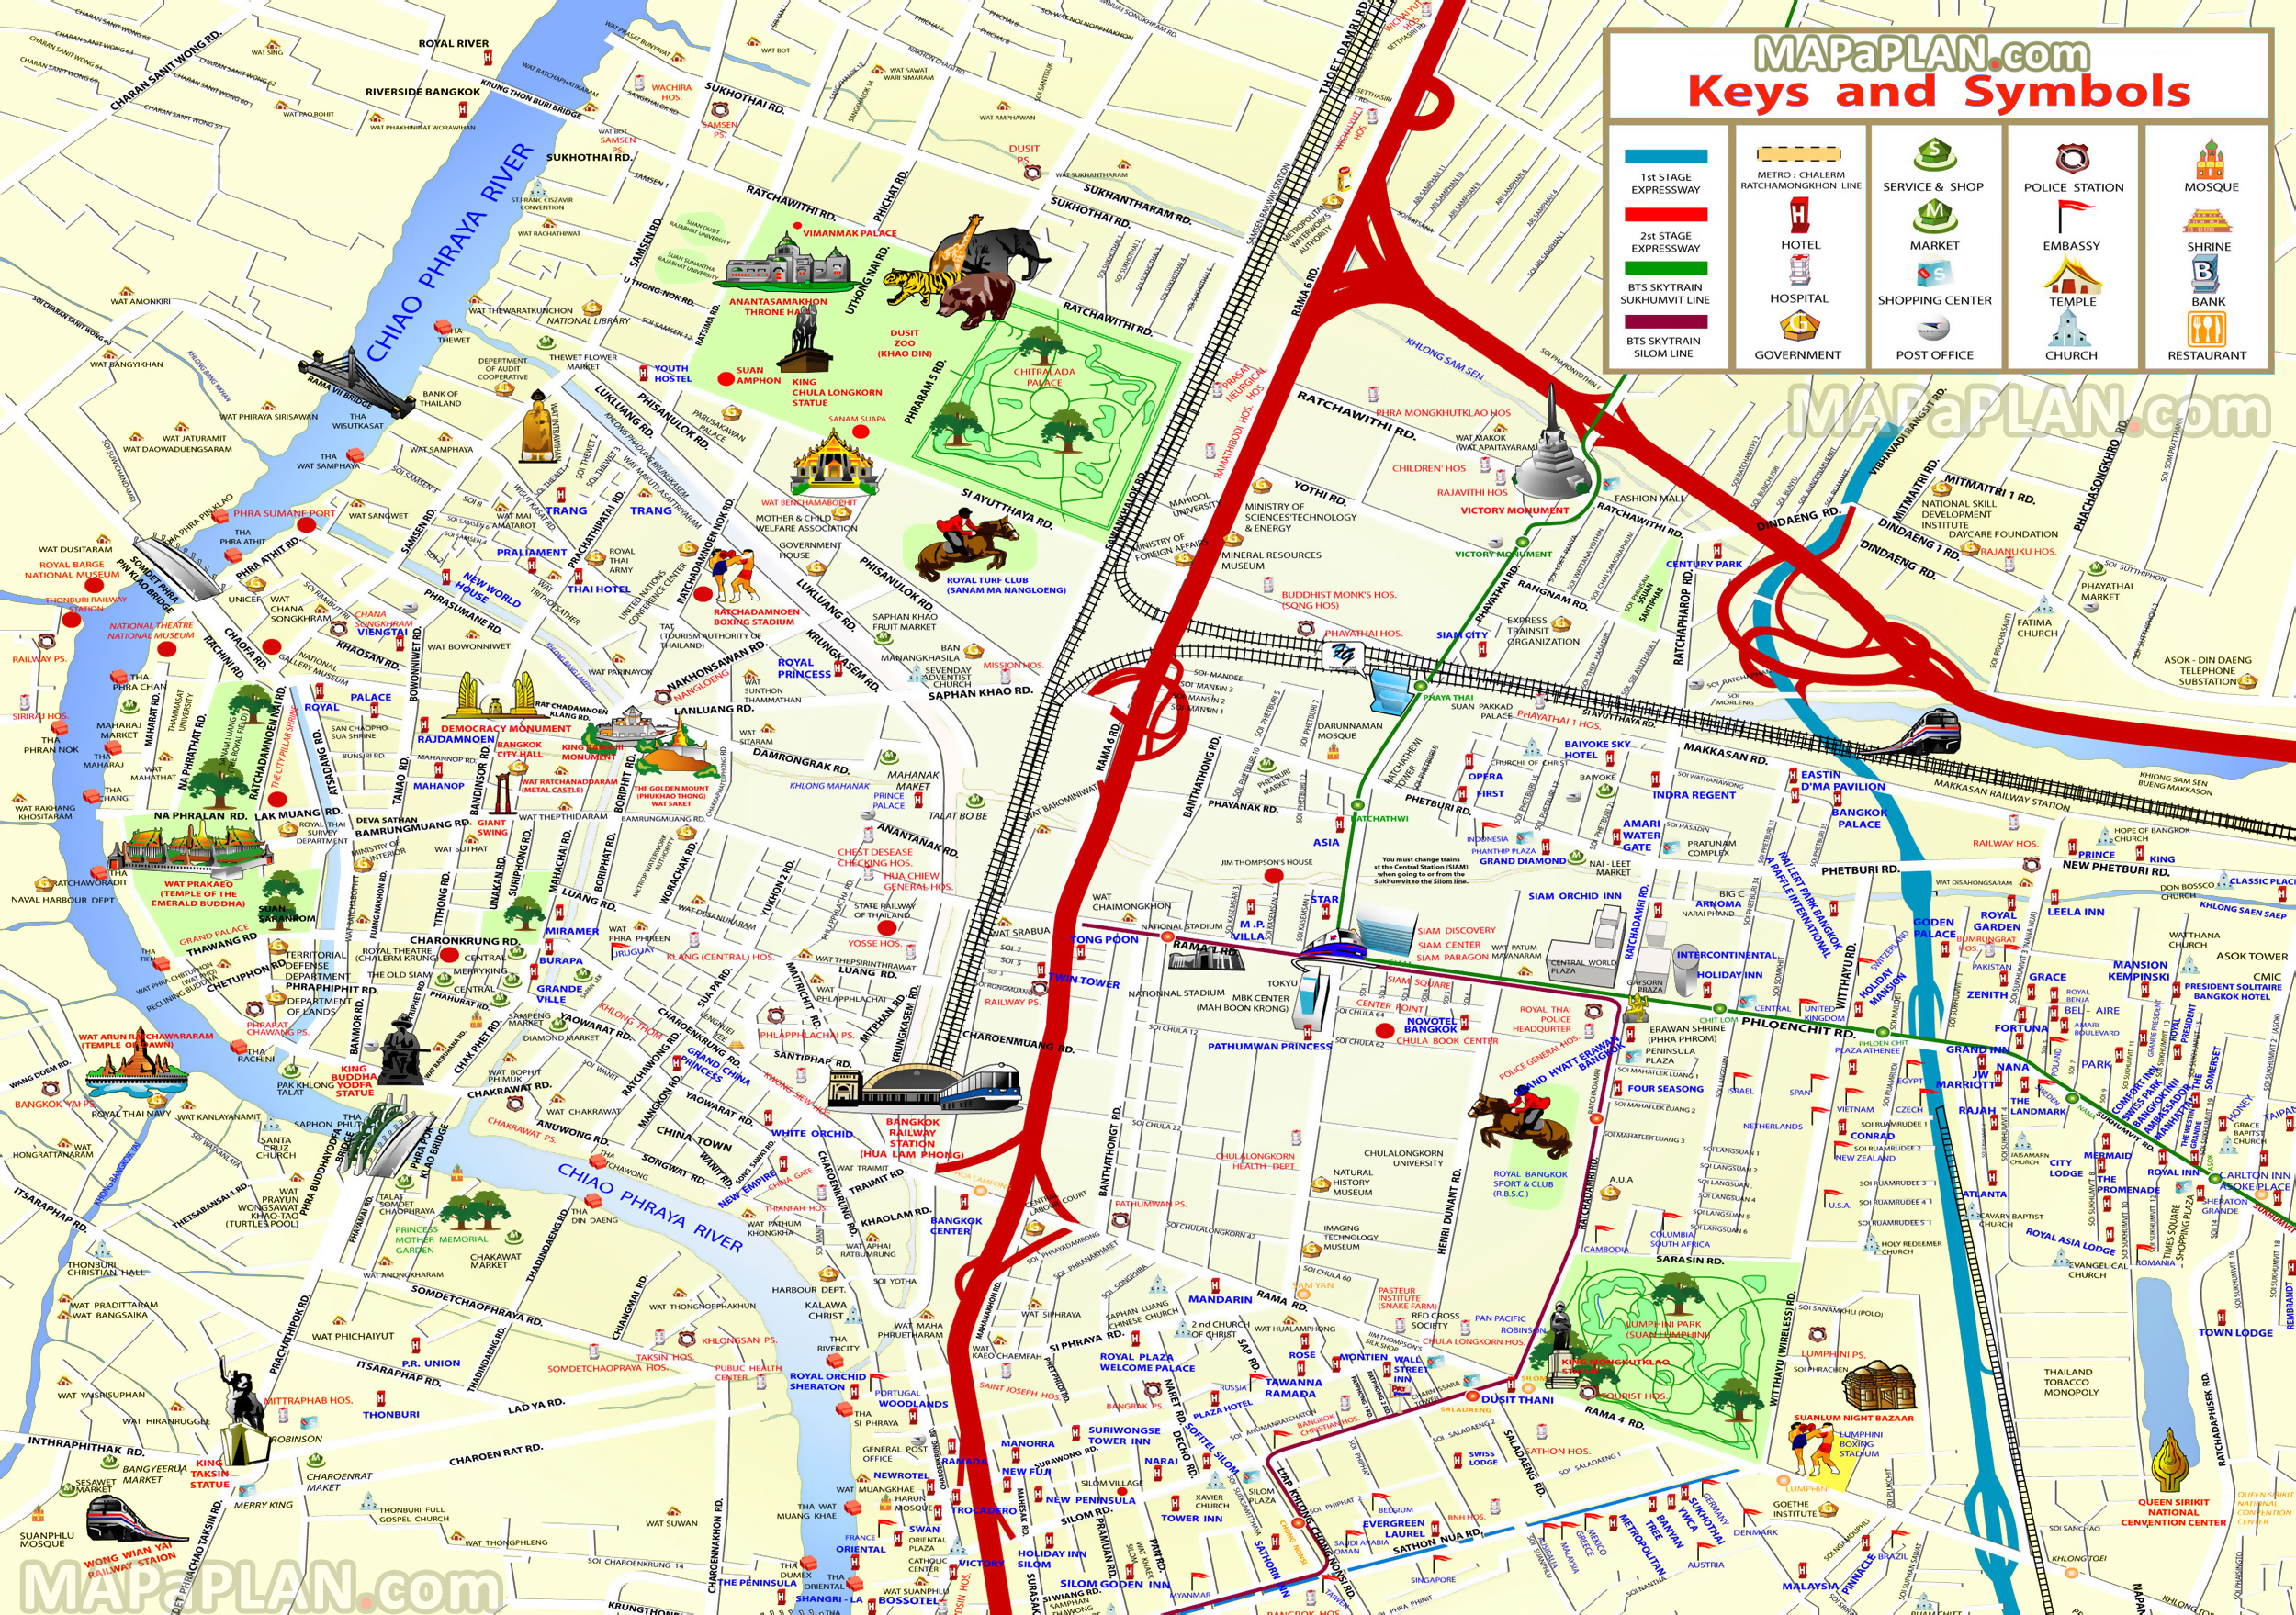 Bangkok maps - Top tourist attractions - Free, printable city street map